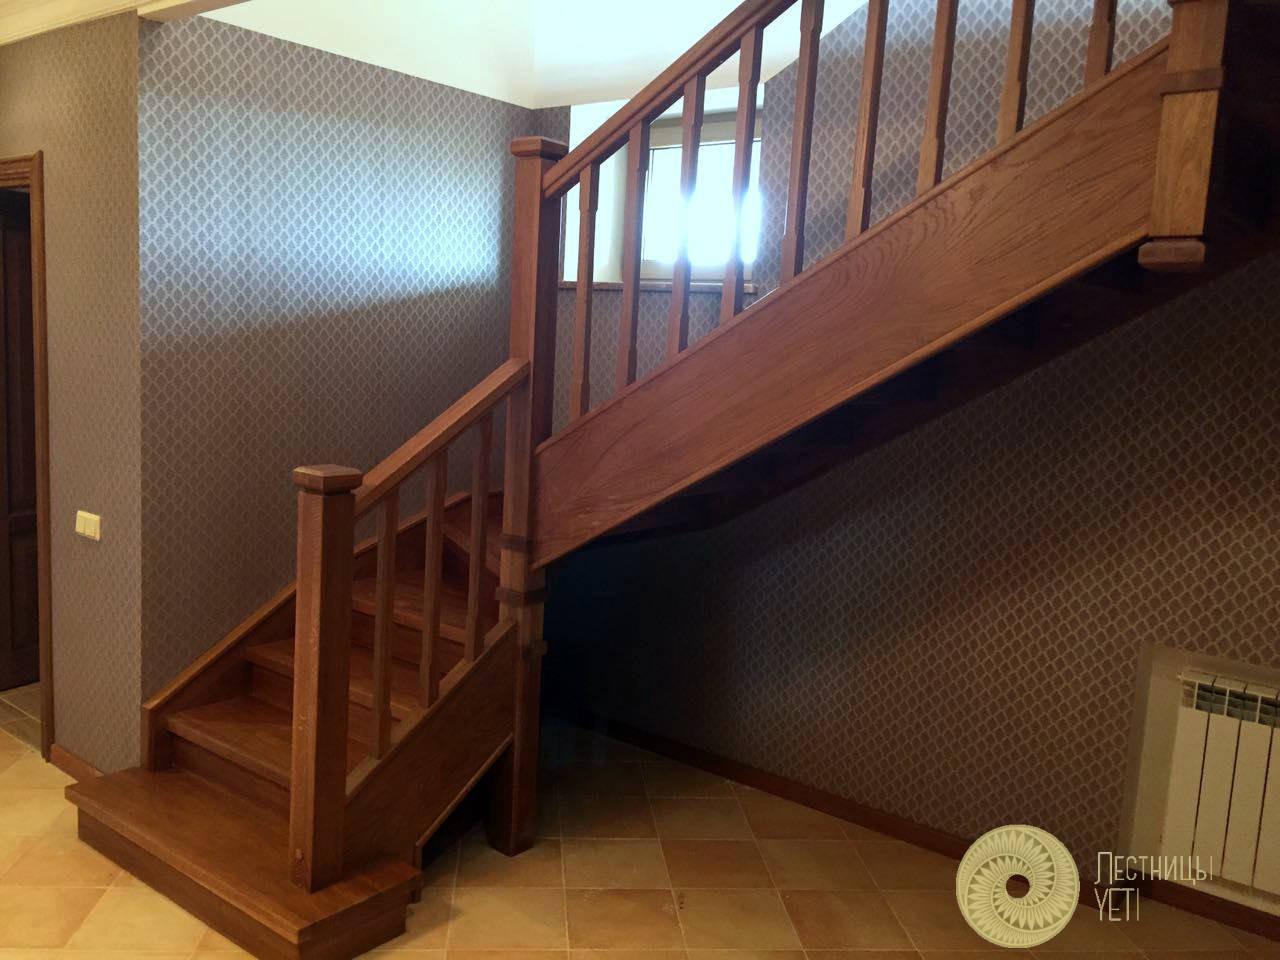 Лестницы, эскалаторы, лифты - Каталог компаний Gut-Comru